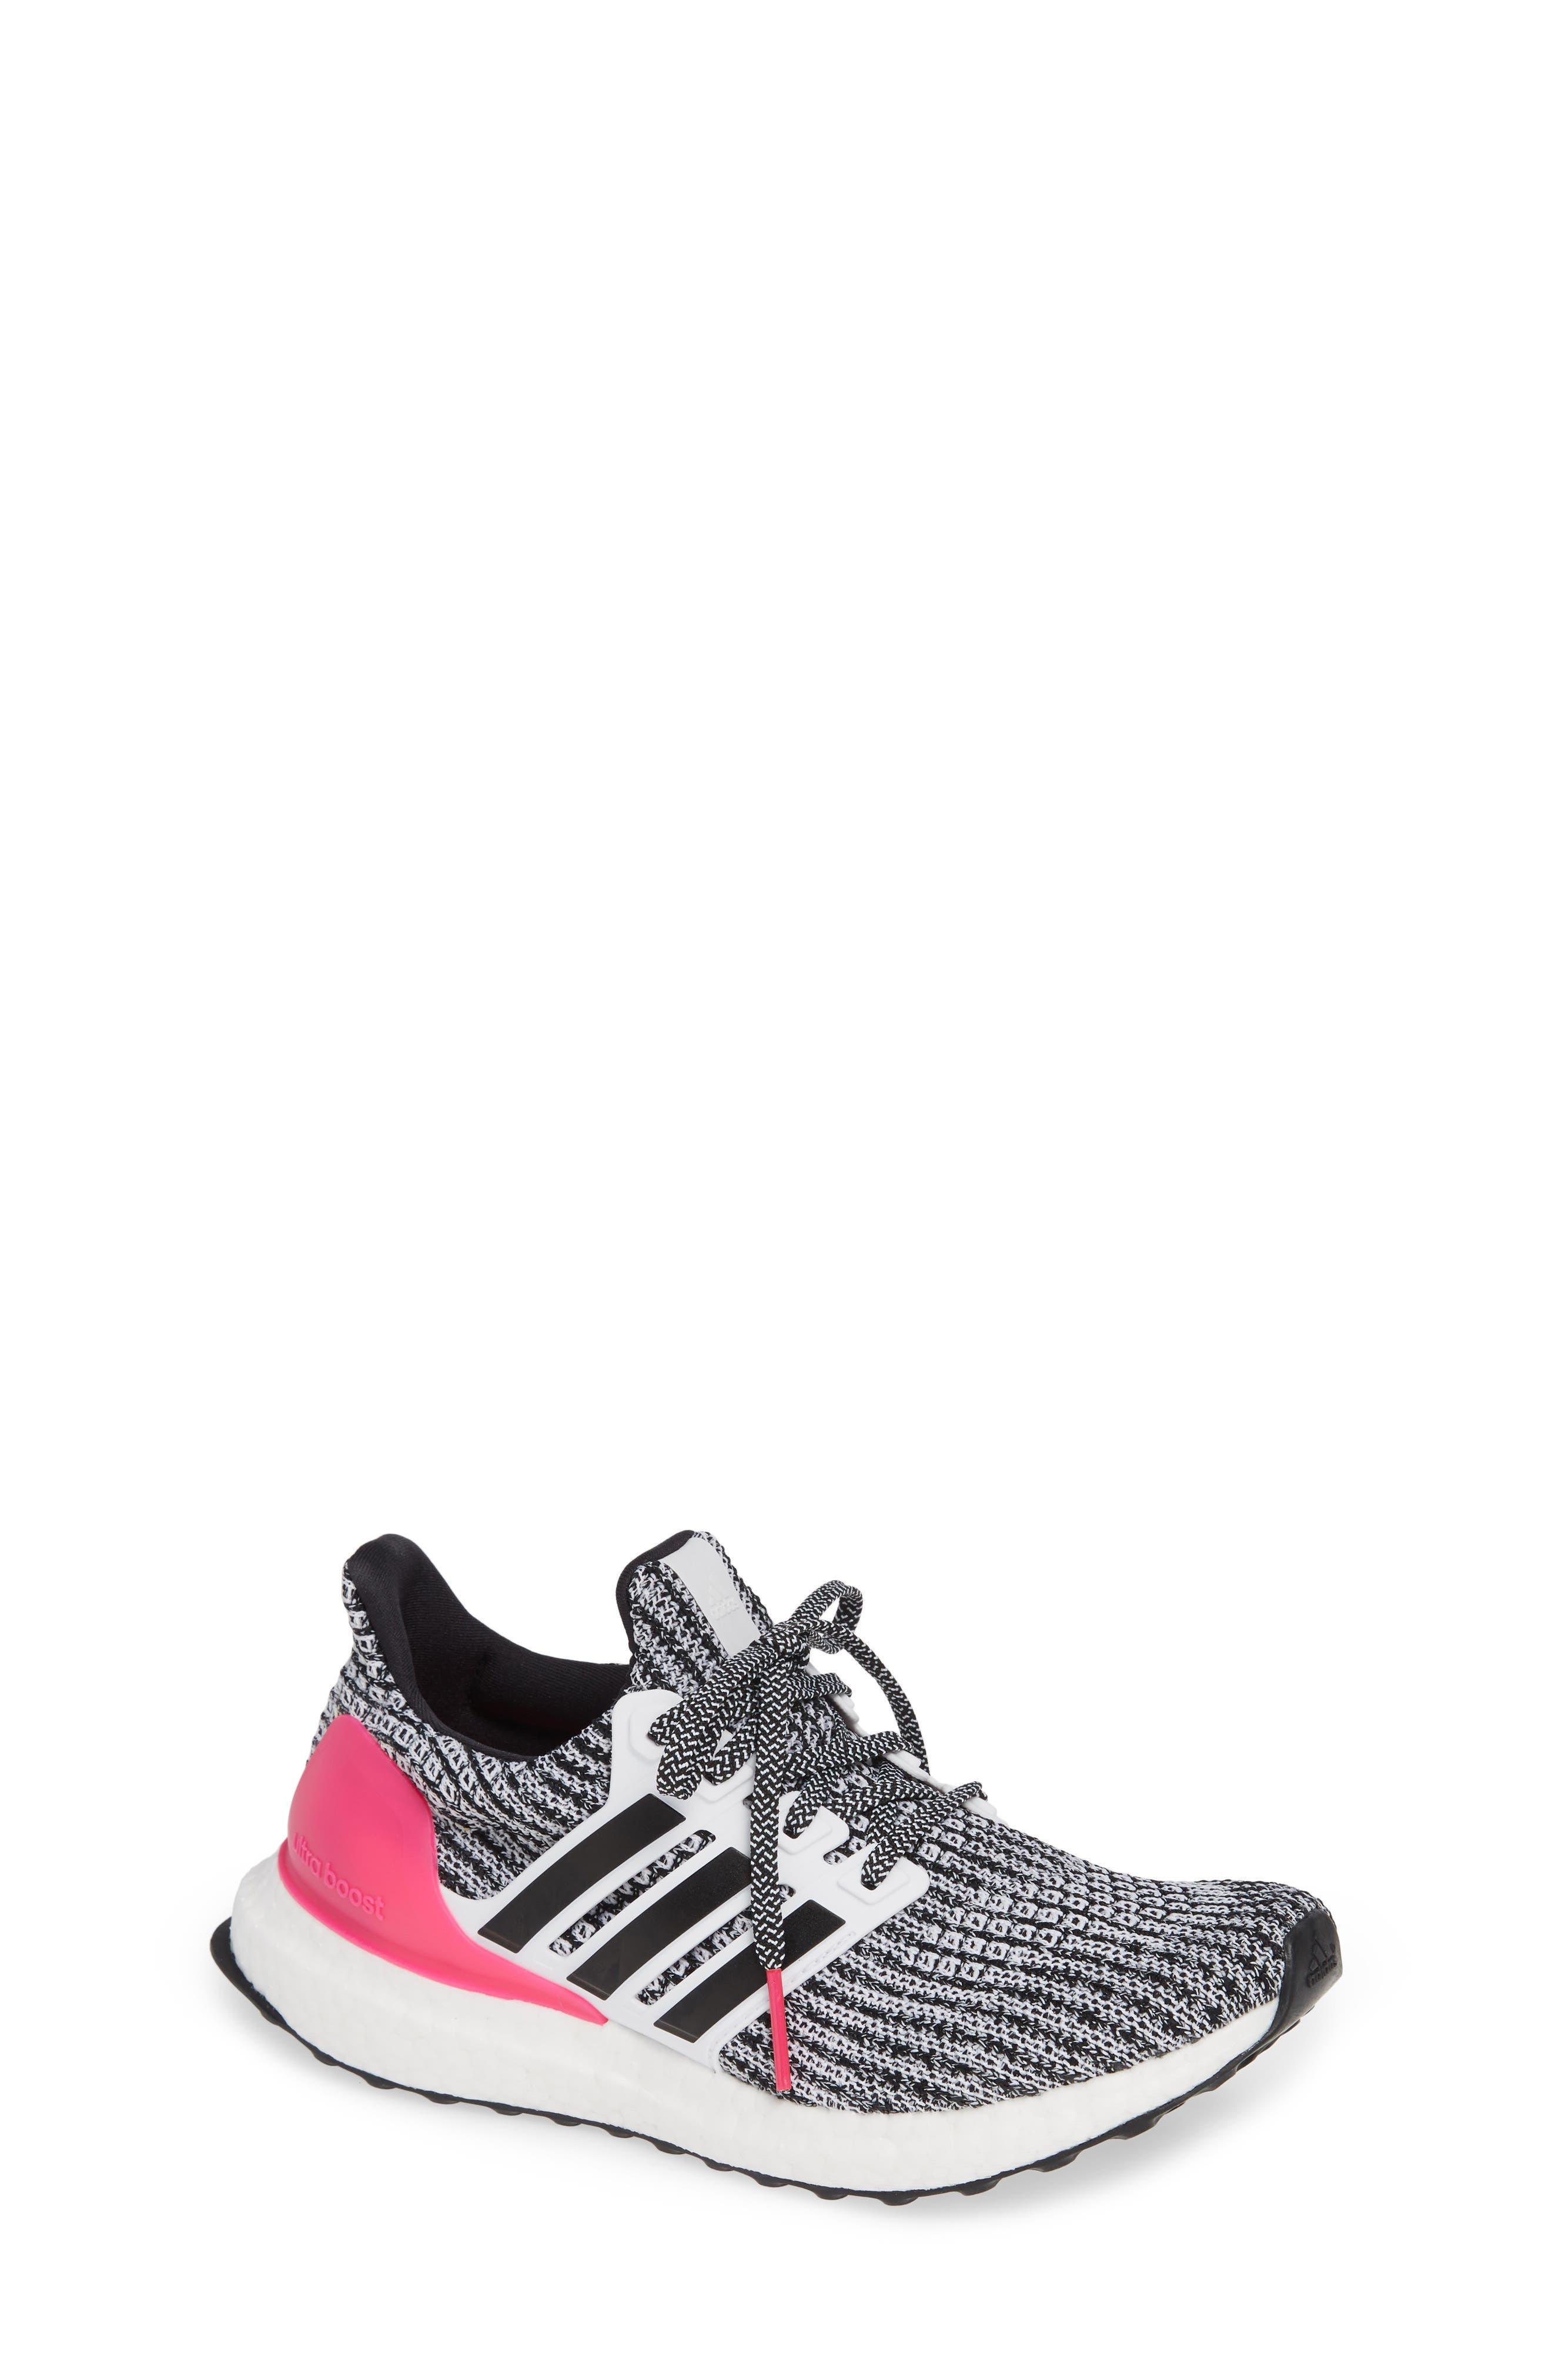 UltraBoost Sneaker,                             Main thumbnail 1, color,                             WHITE/ BLACK/ SHOCK PINK